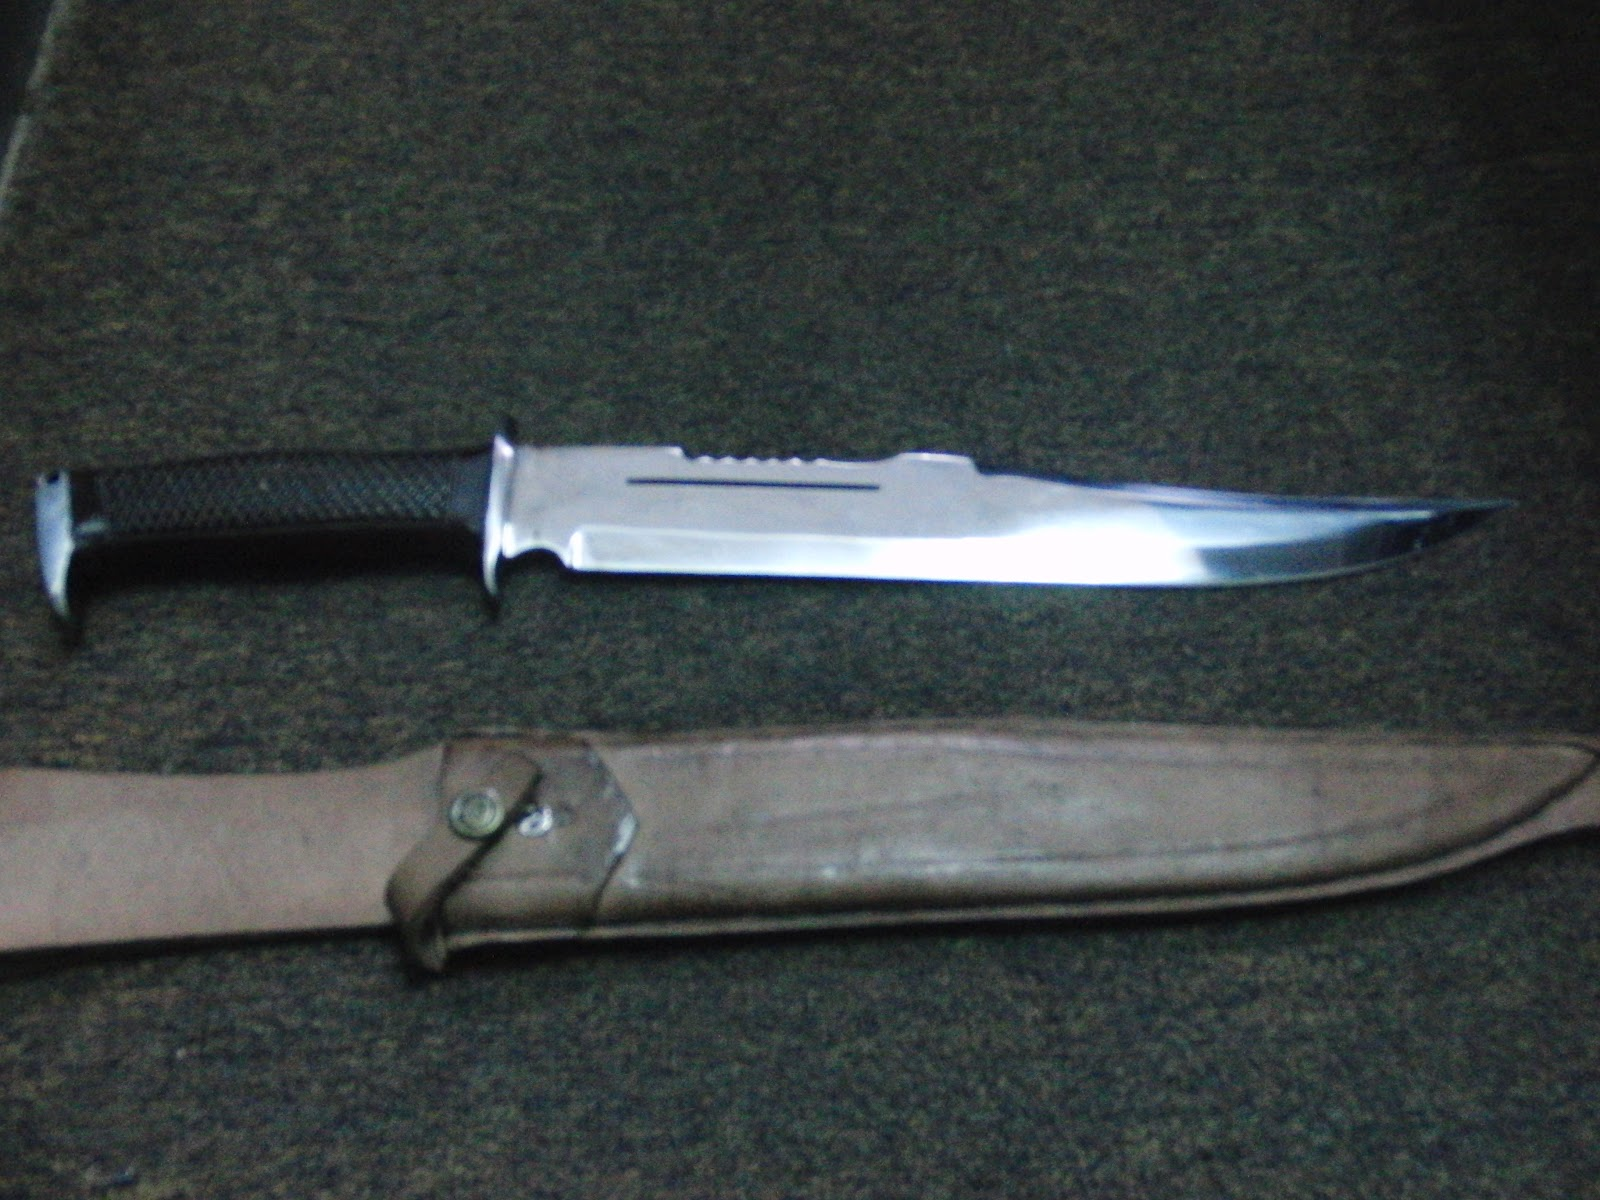 Macam macam pisau: Rambo 3